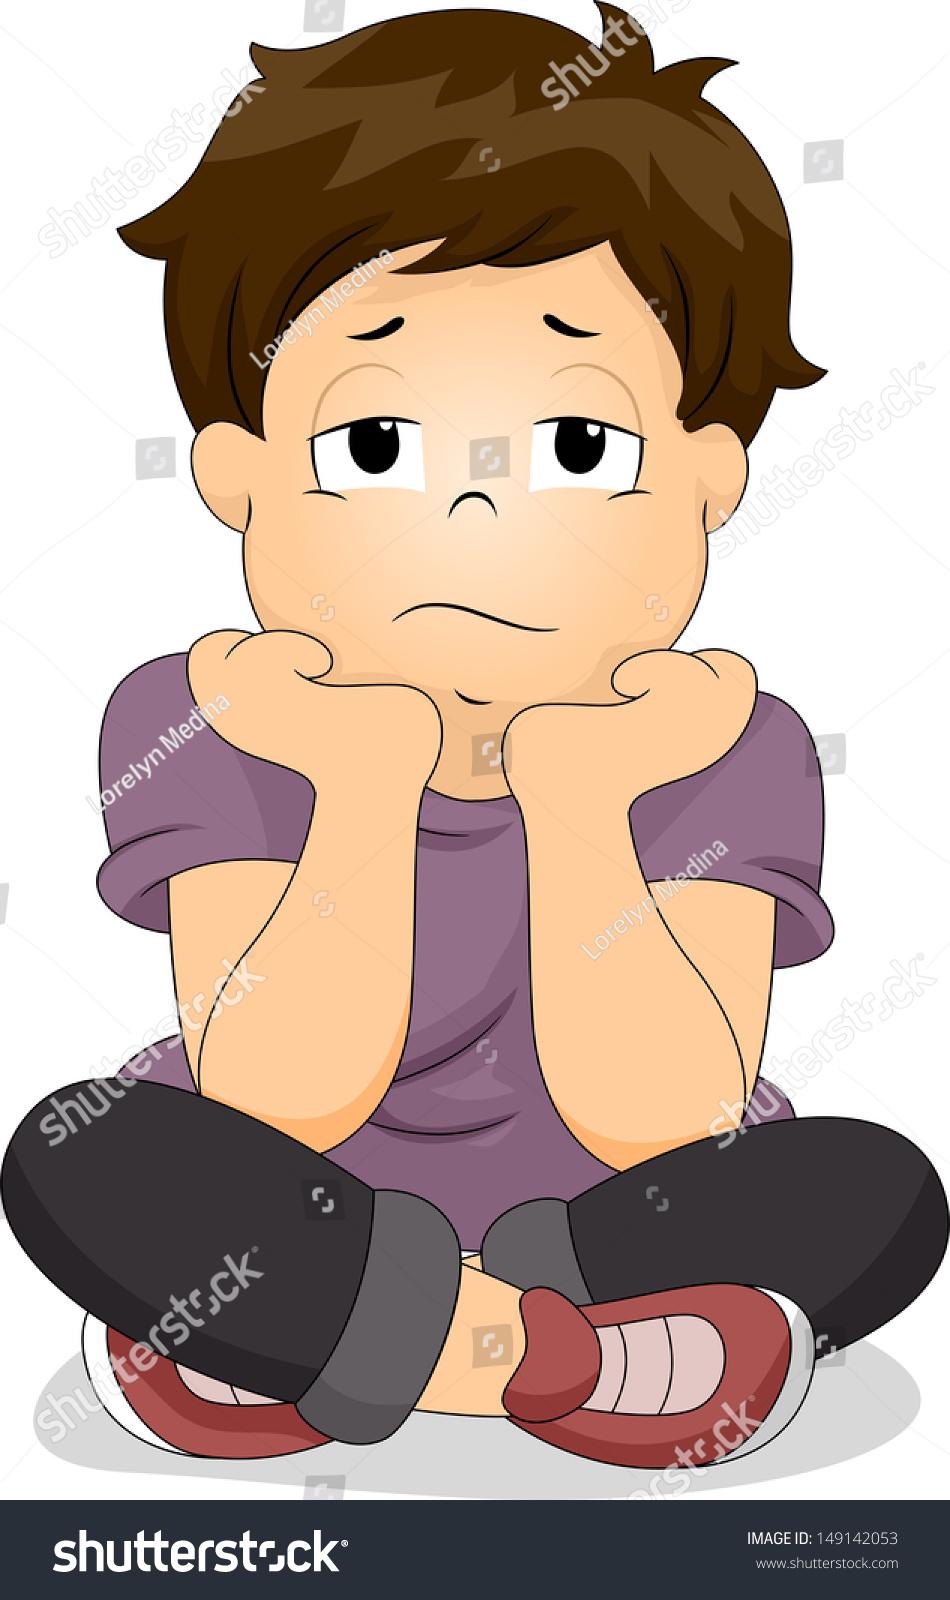 Illustration Bored Boy His Chin Resting Stock Vector ...